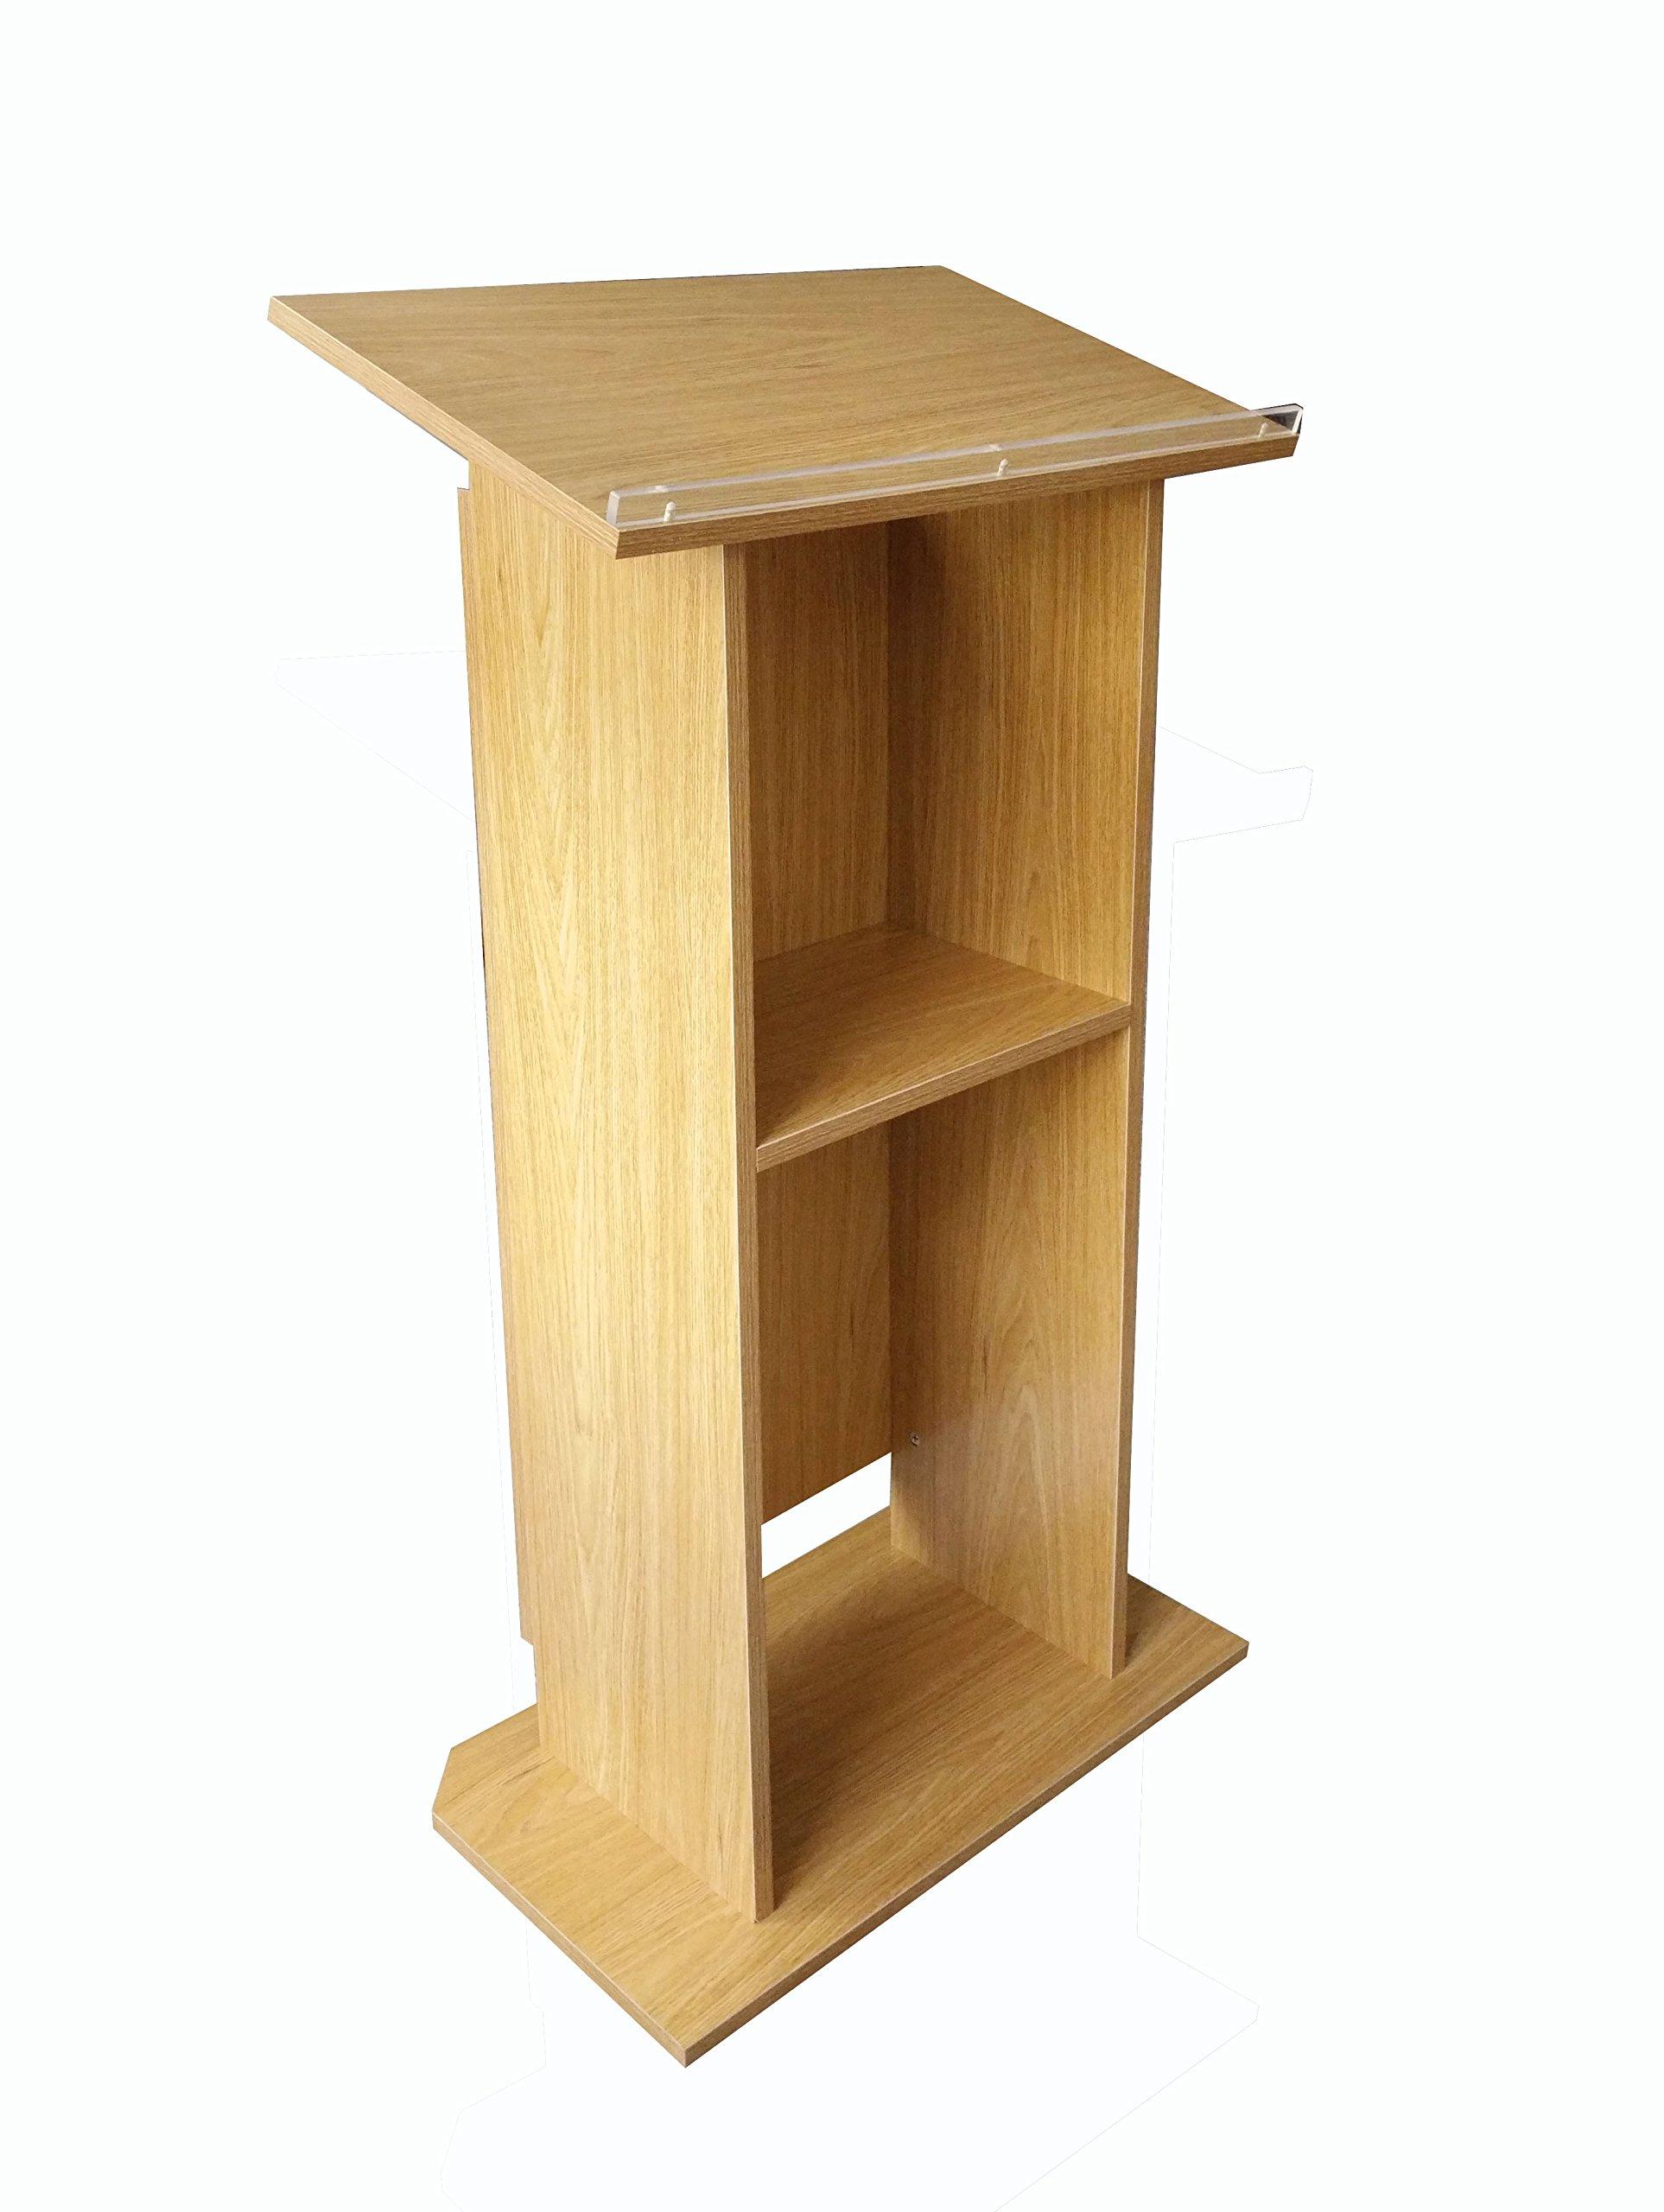 FixtureDisplays Wood (MDF) Podium Pulpit Lectern Reception 14302 by FixtureDisplays